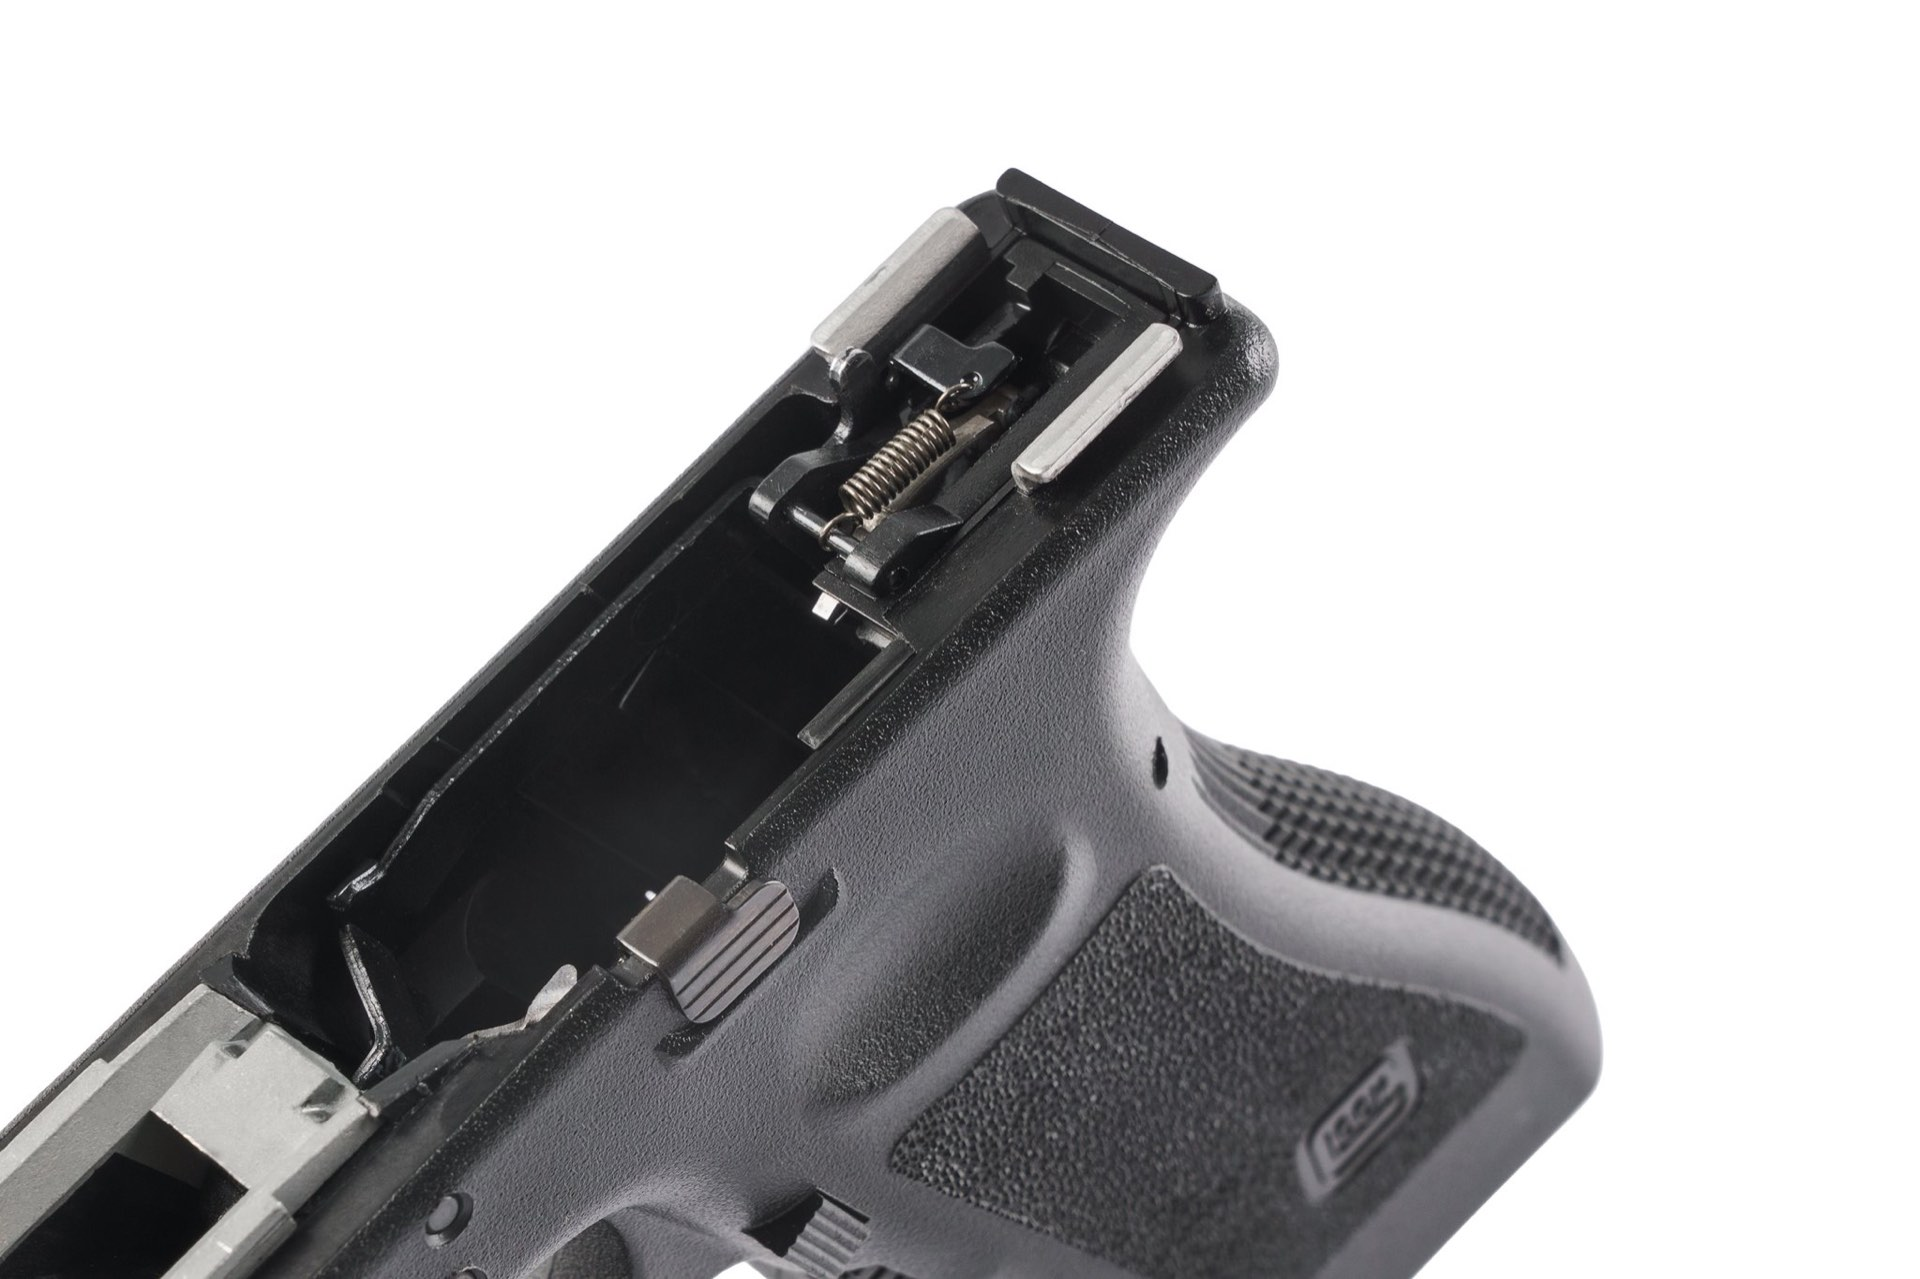 GHK Umarex Glock 17 Gen 3 GBB (mechanizm)